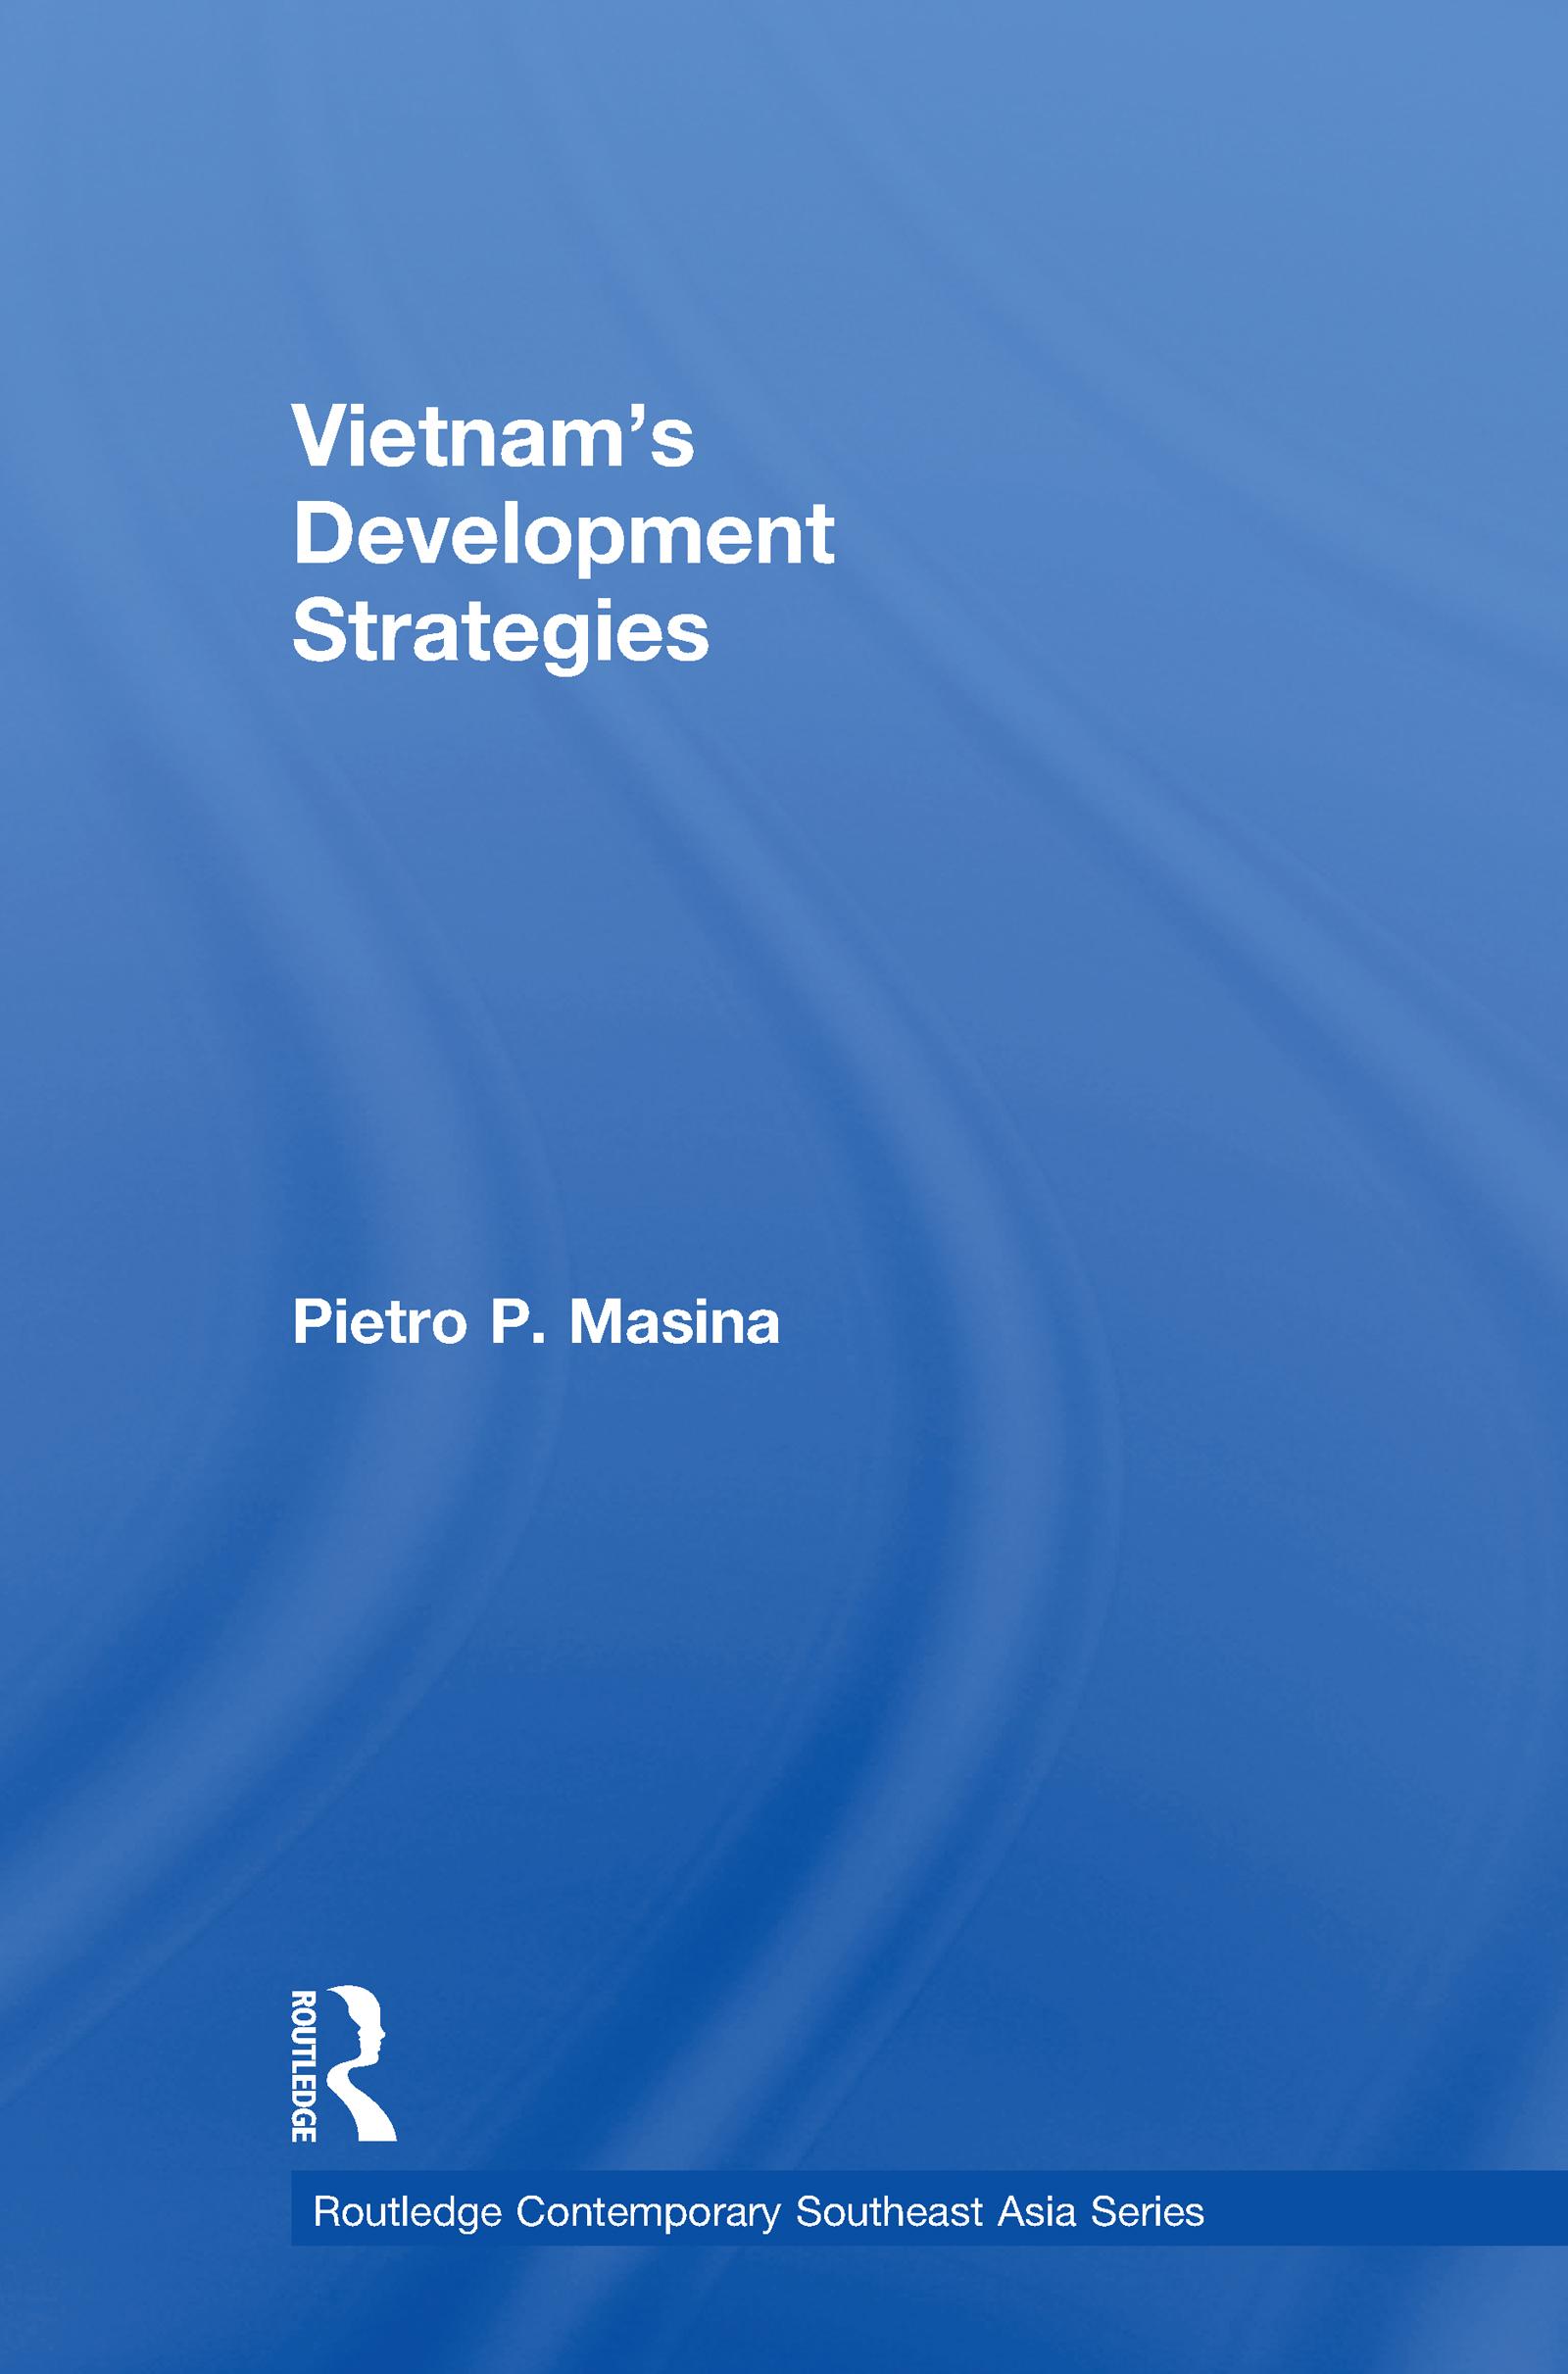 Download Ebook Vietnam's Development Strategies by Pietro Masina Pdf